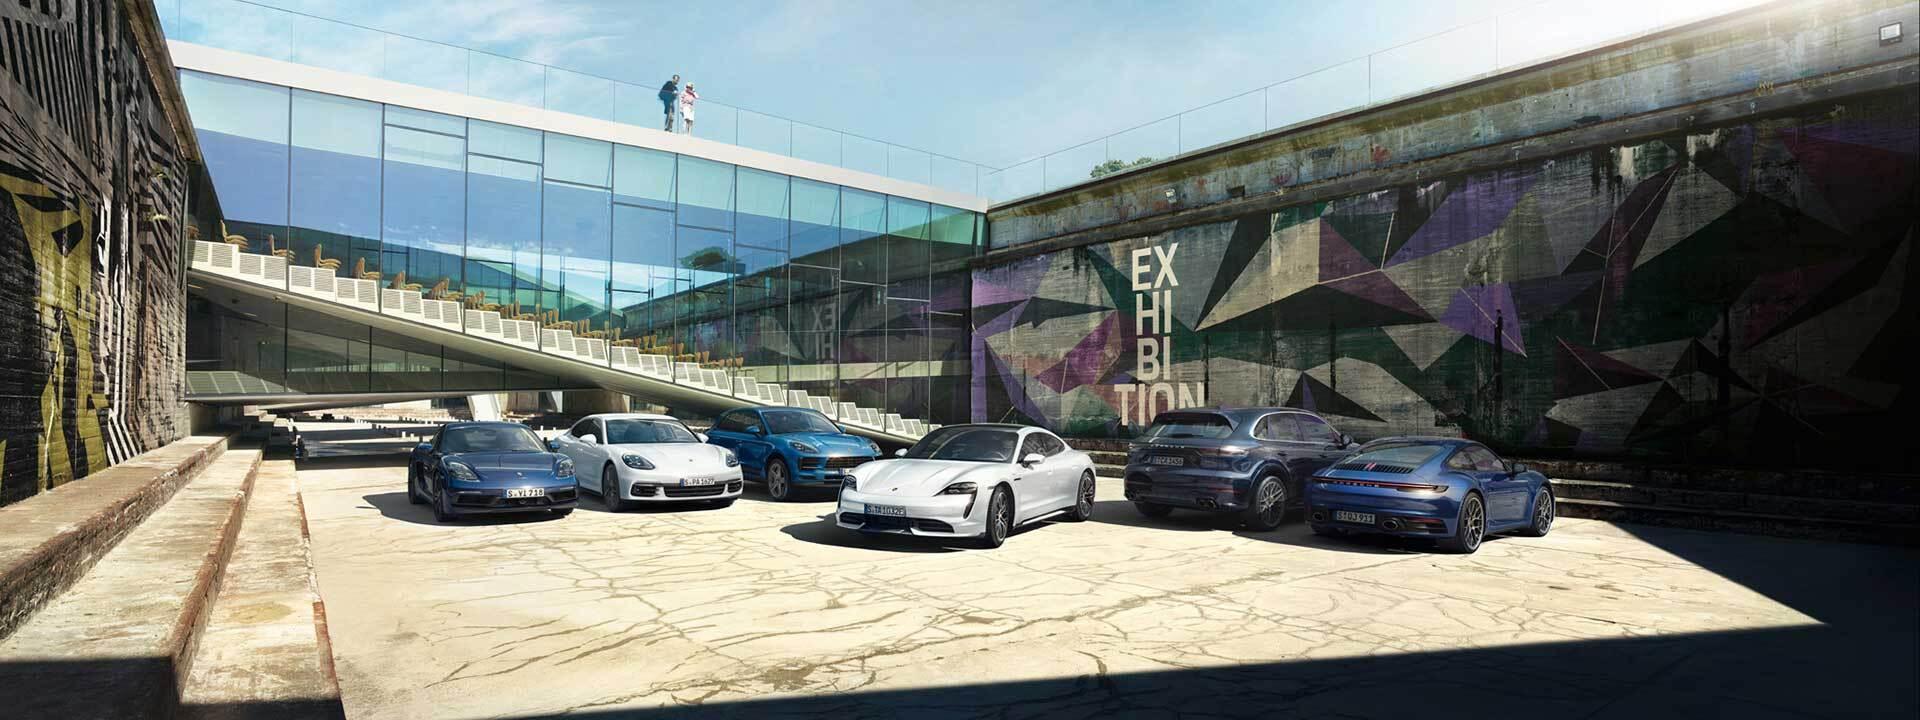 The Porsche lineup in Newark, DE